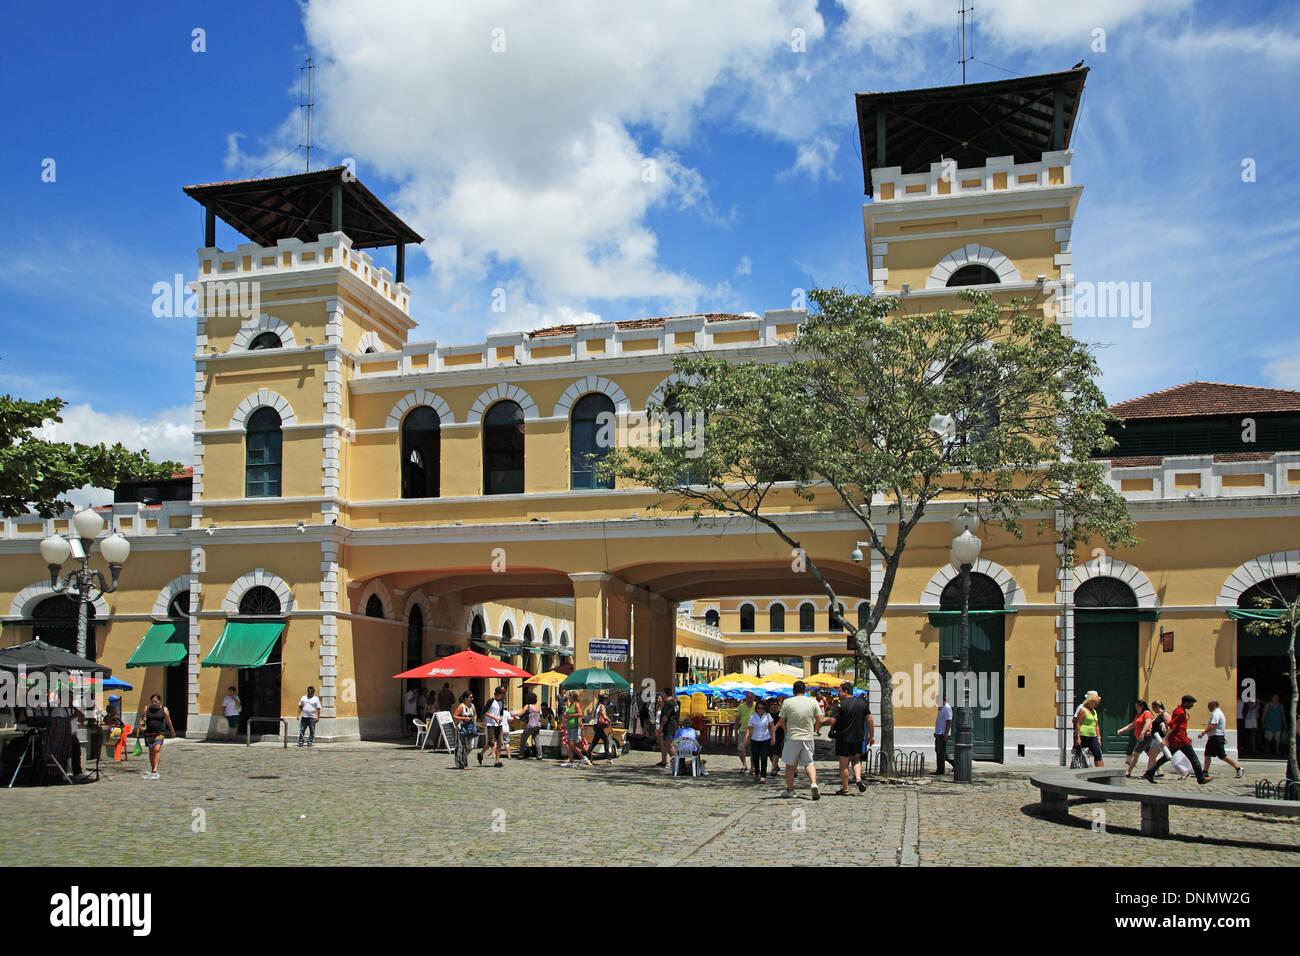 Brazil, Santa catarina, Florianopolis, Municipal Public Market - Stock Image